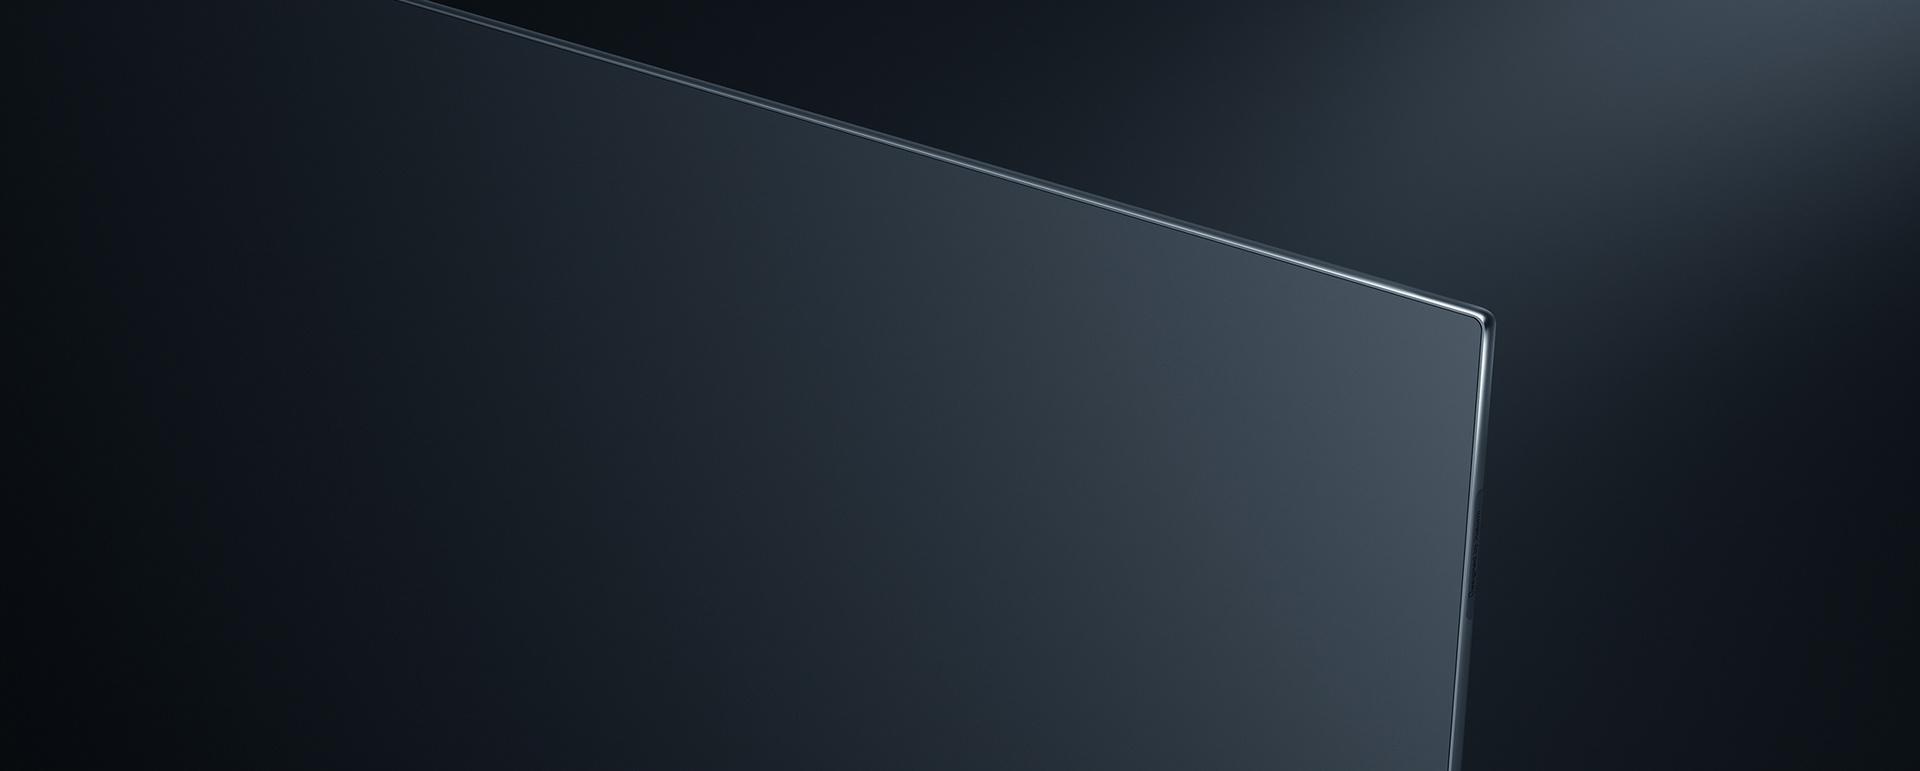 Xiaomi okostévé